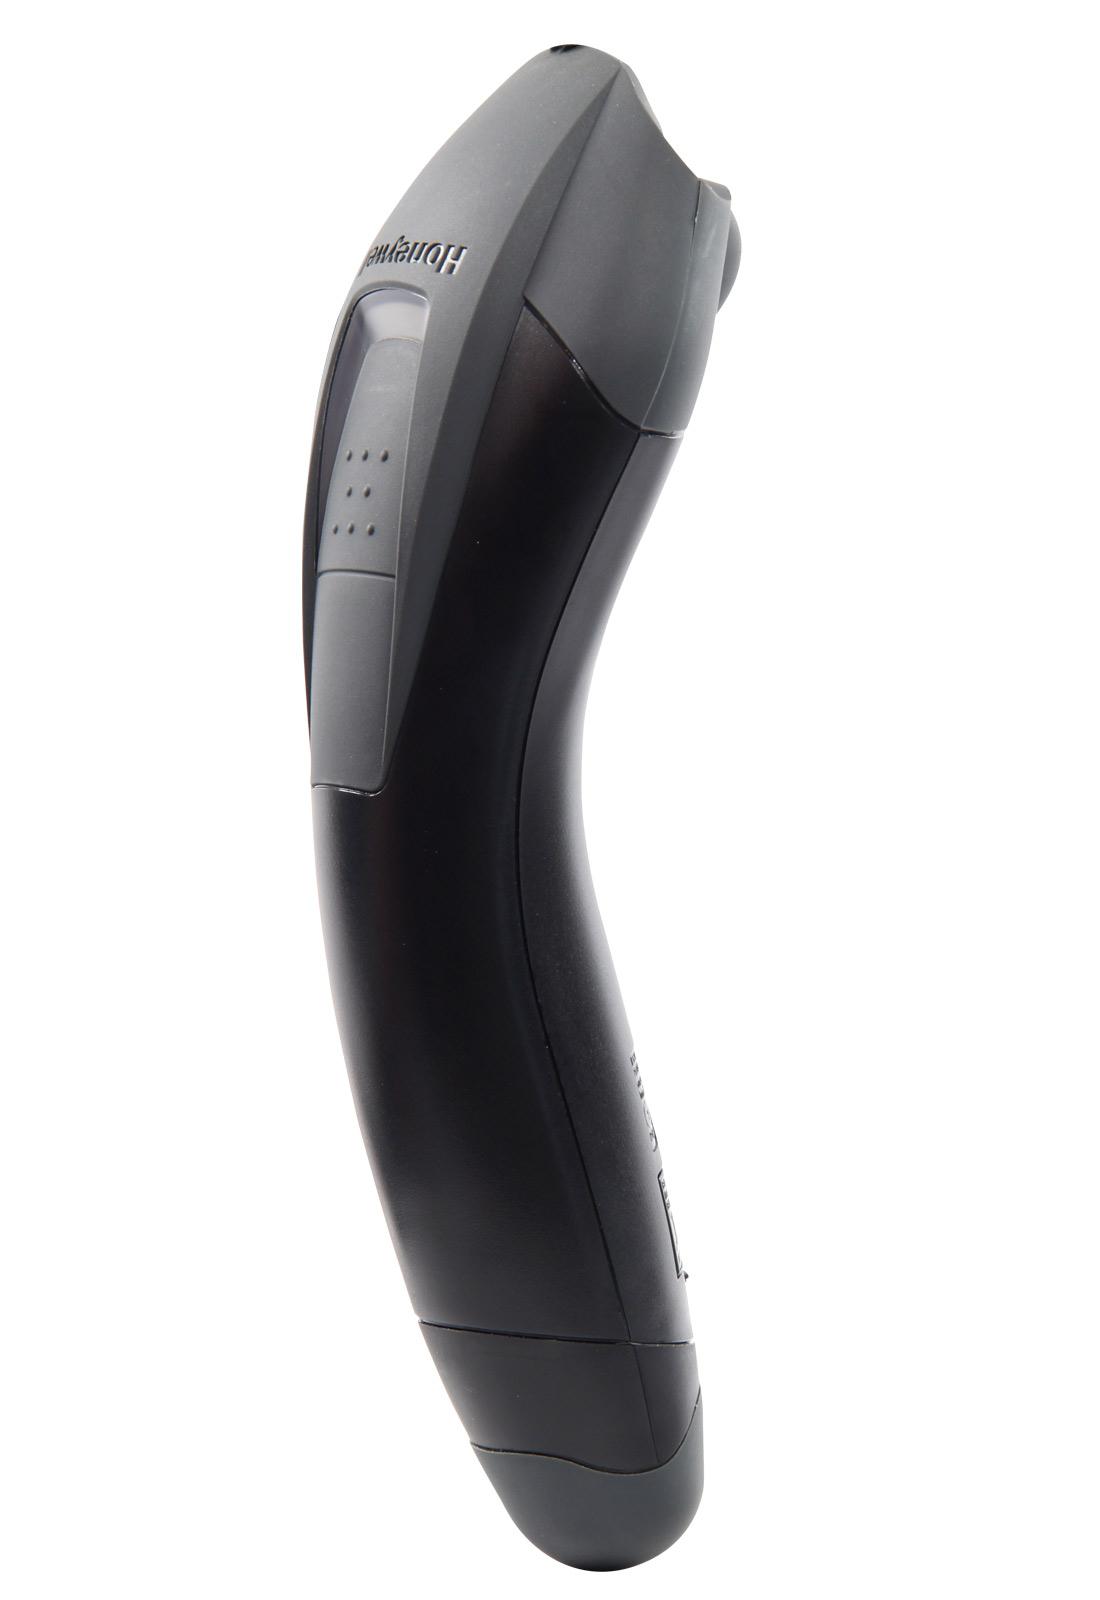 HONEYWELL Voyager 1202g - Barcode-Scanner - Handgerät